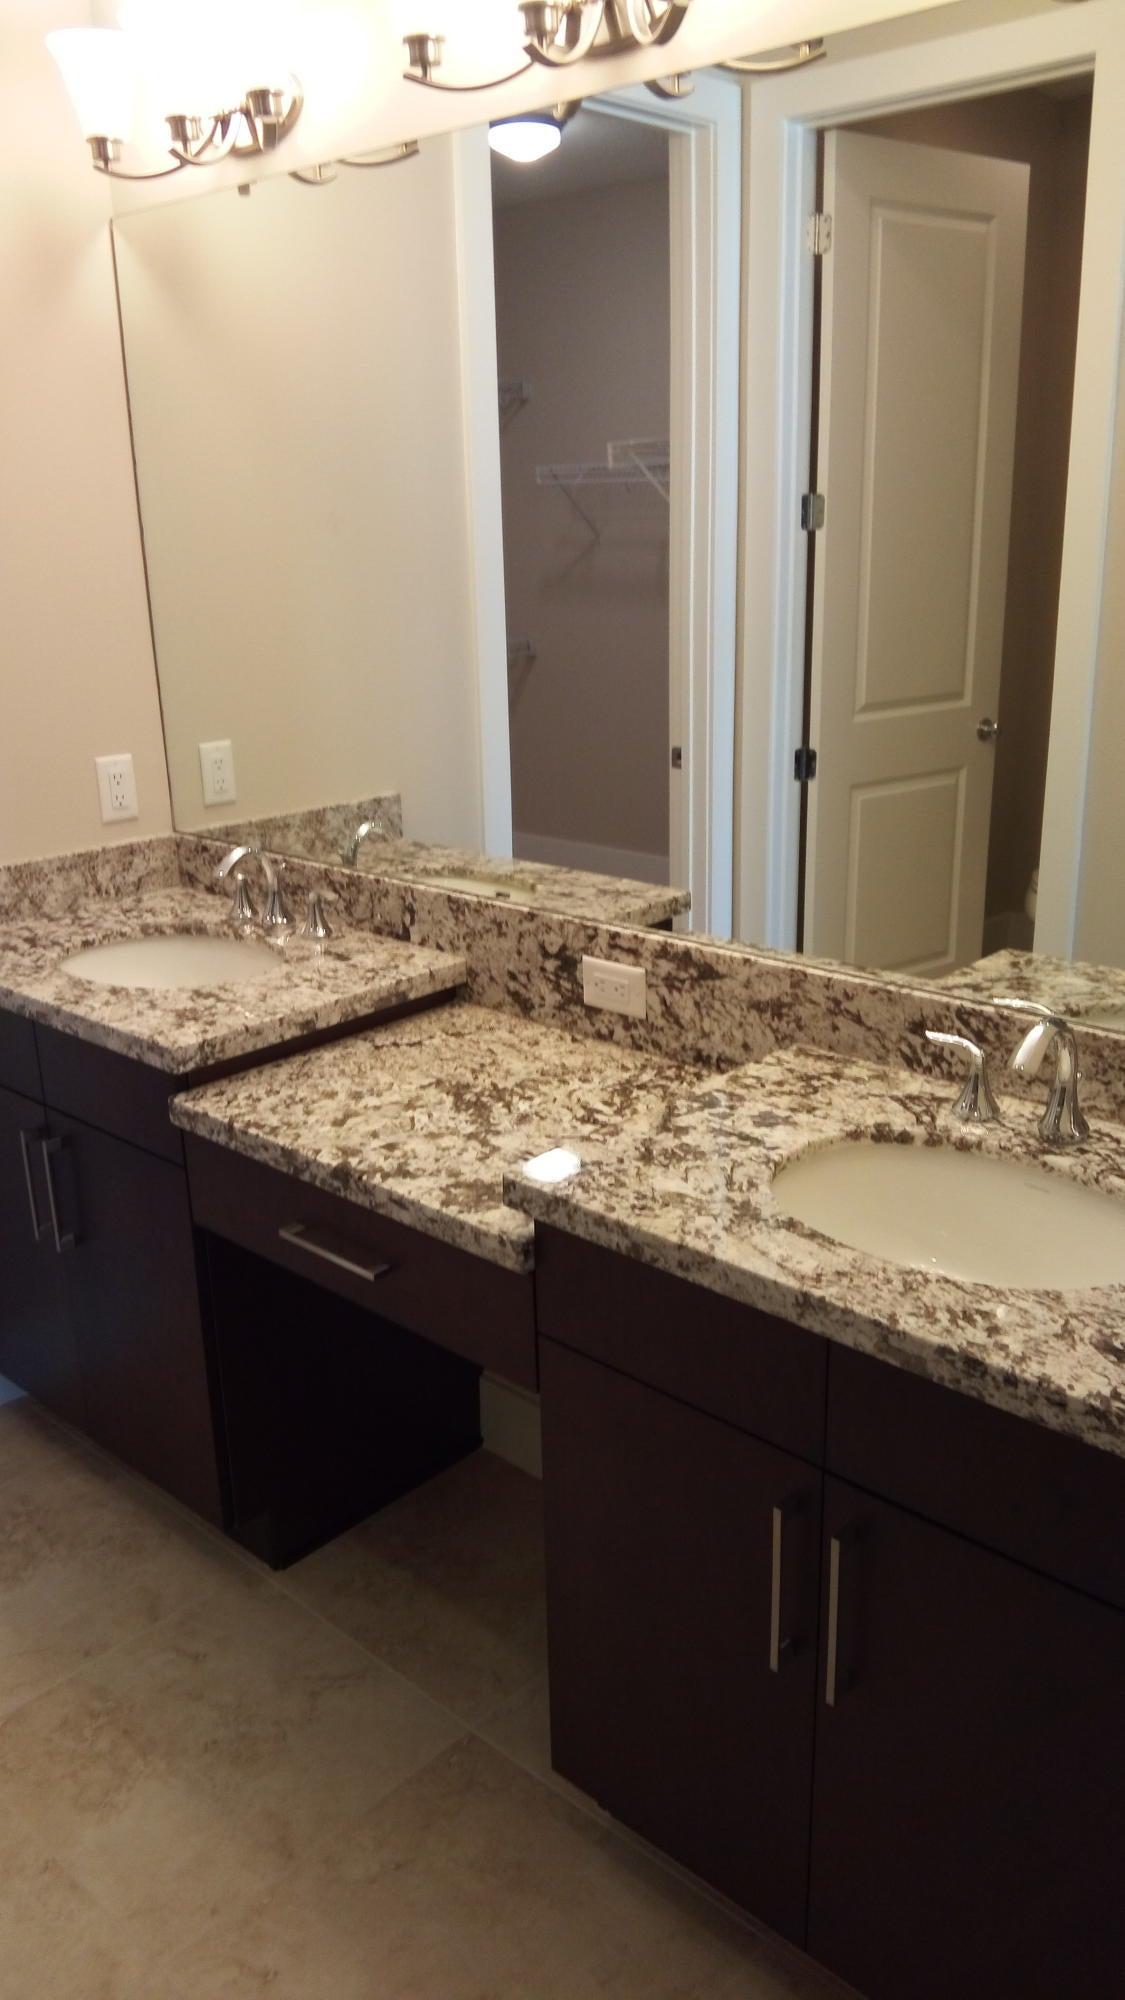 Additional photo for property listing at 7112 Edison 7112 Edison Palm Beach Gardens, Florida 33418 United States